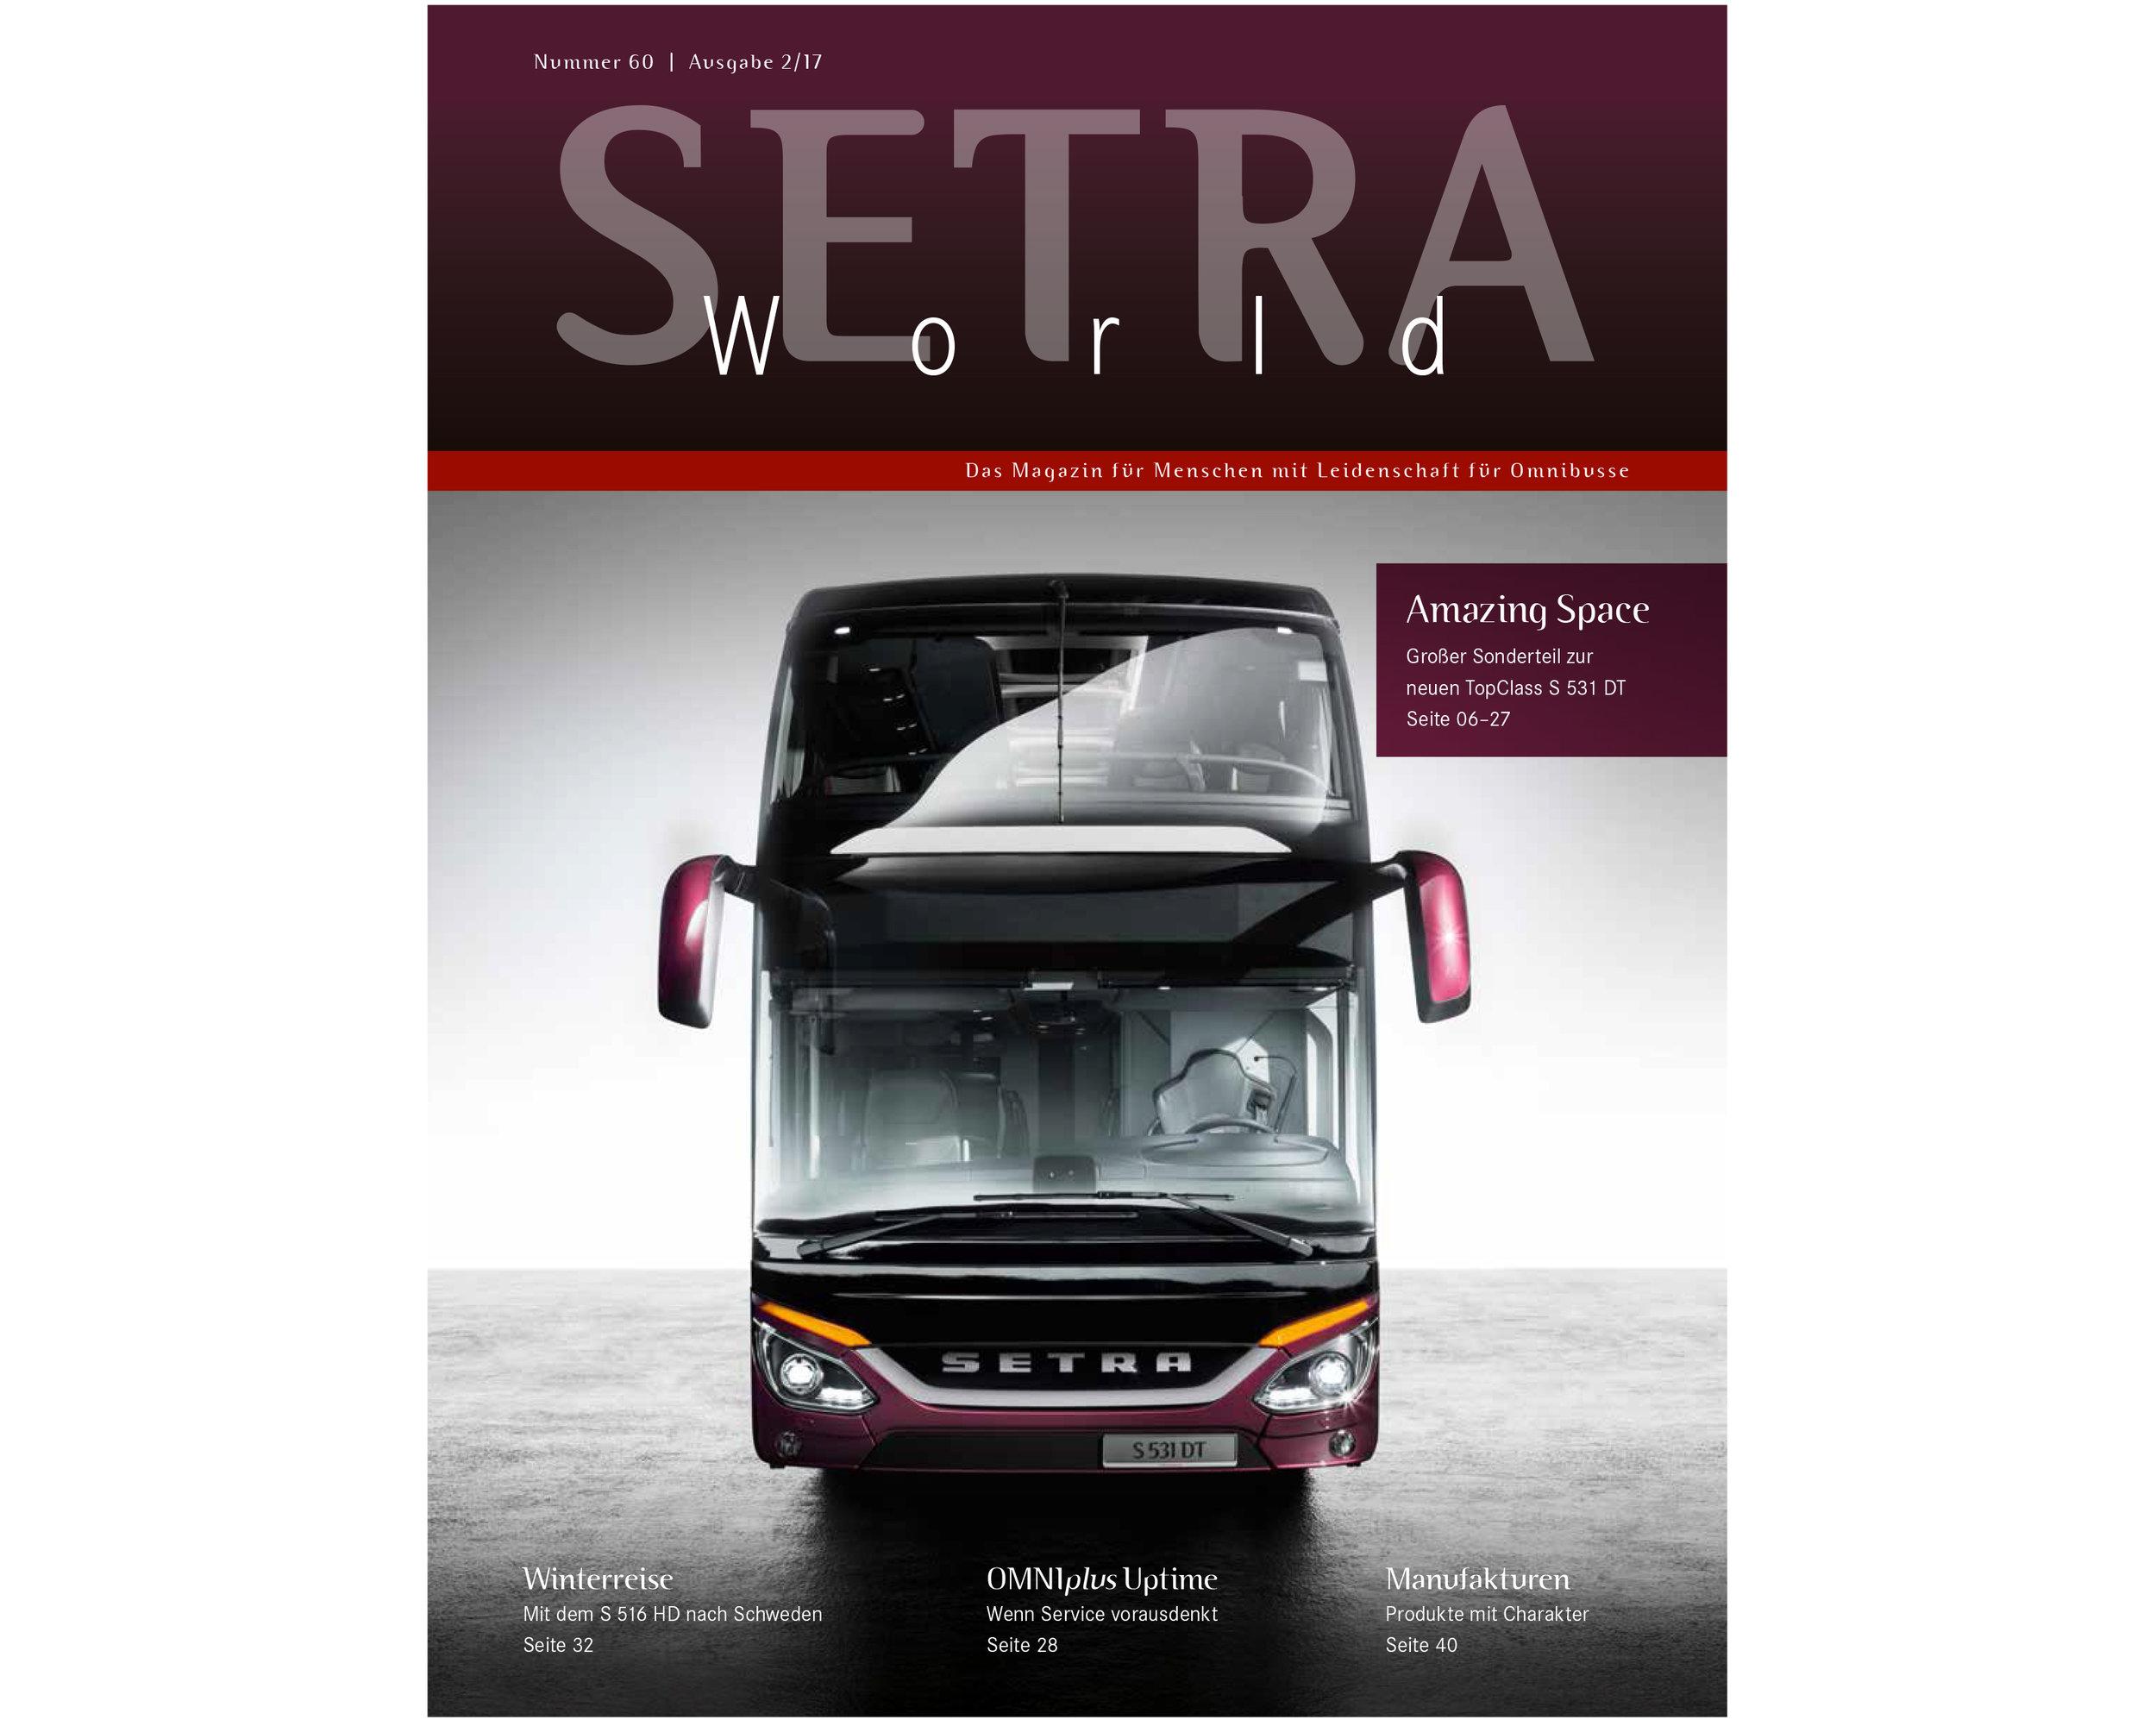 Setra_World_cover_07.jpg